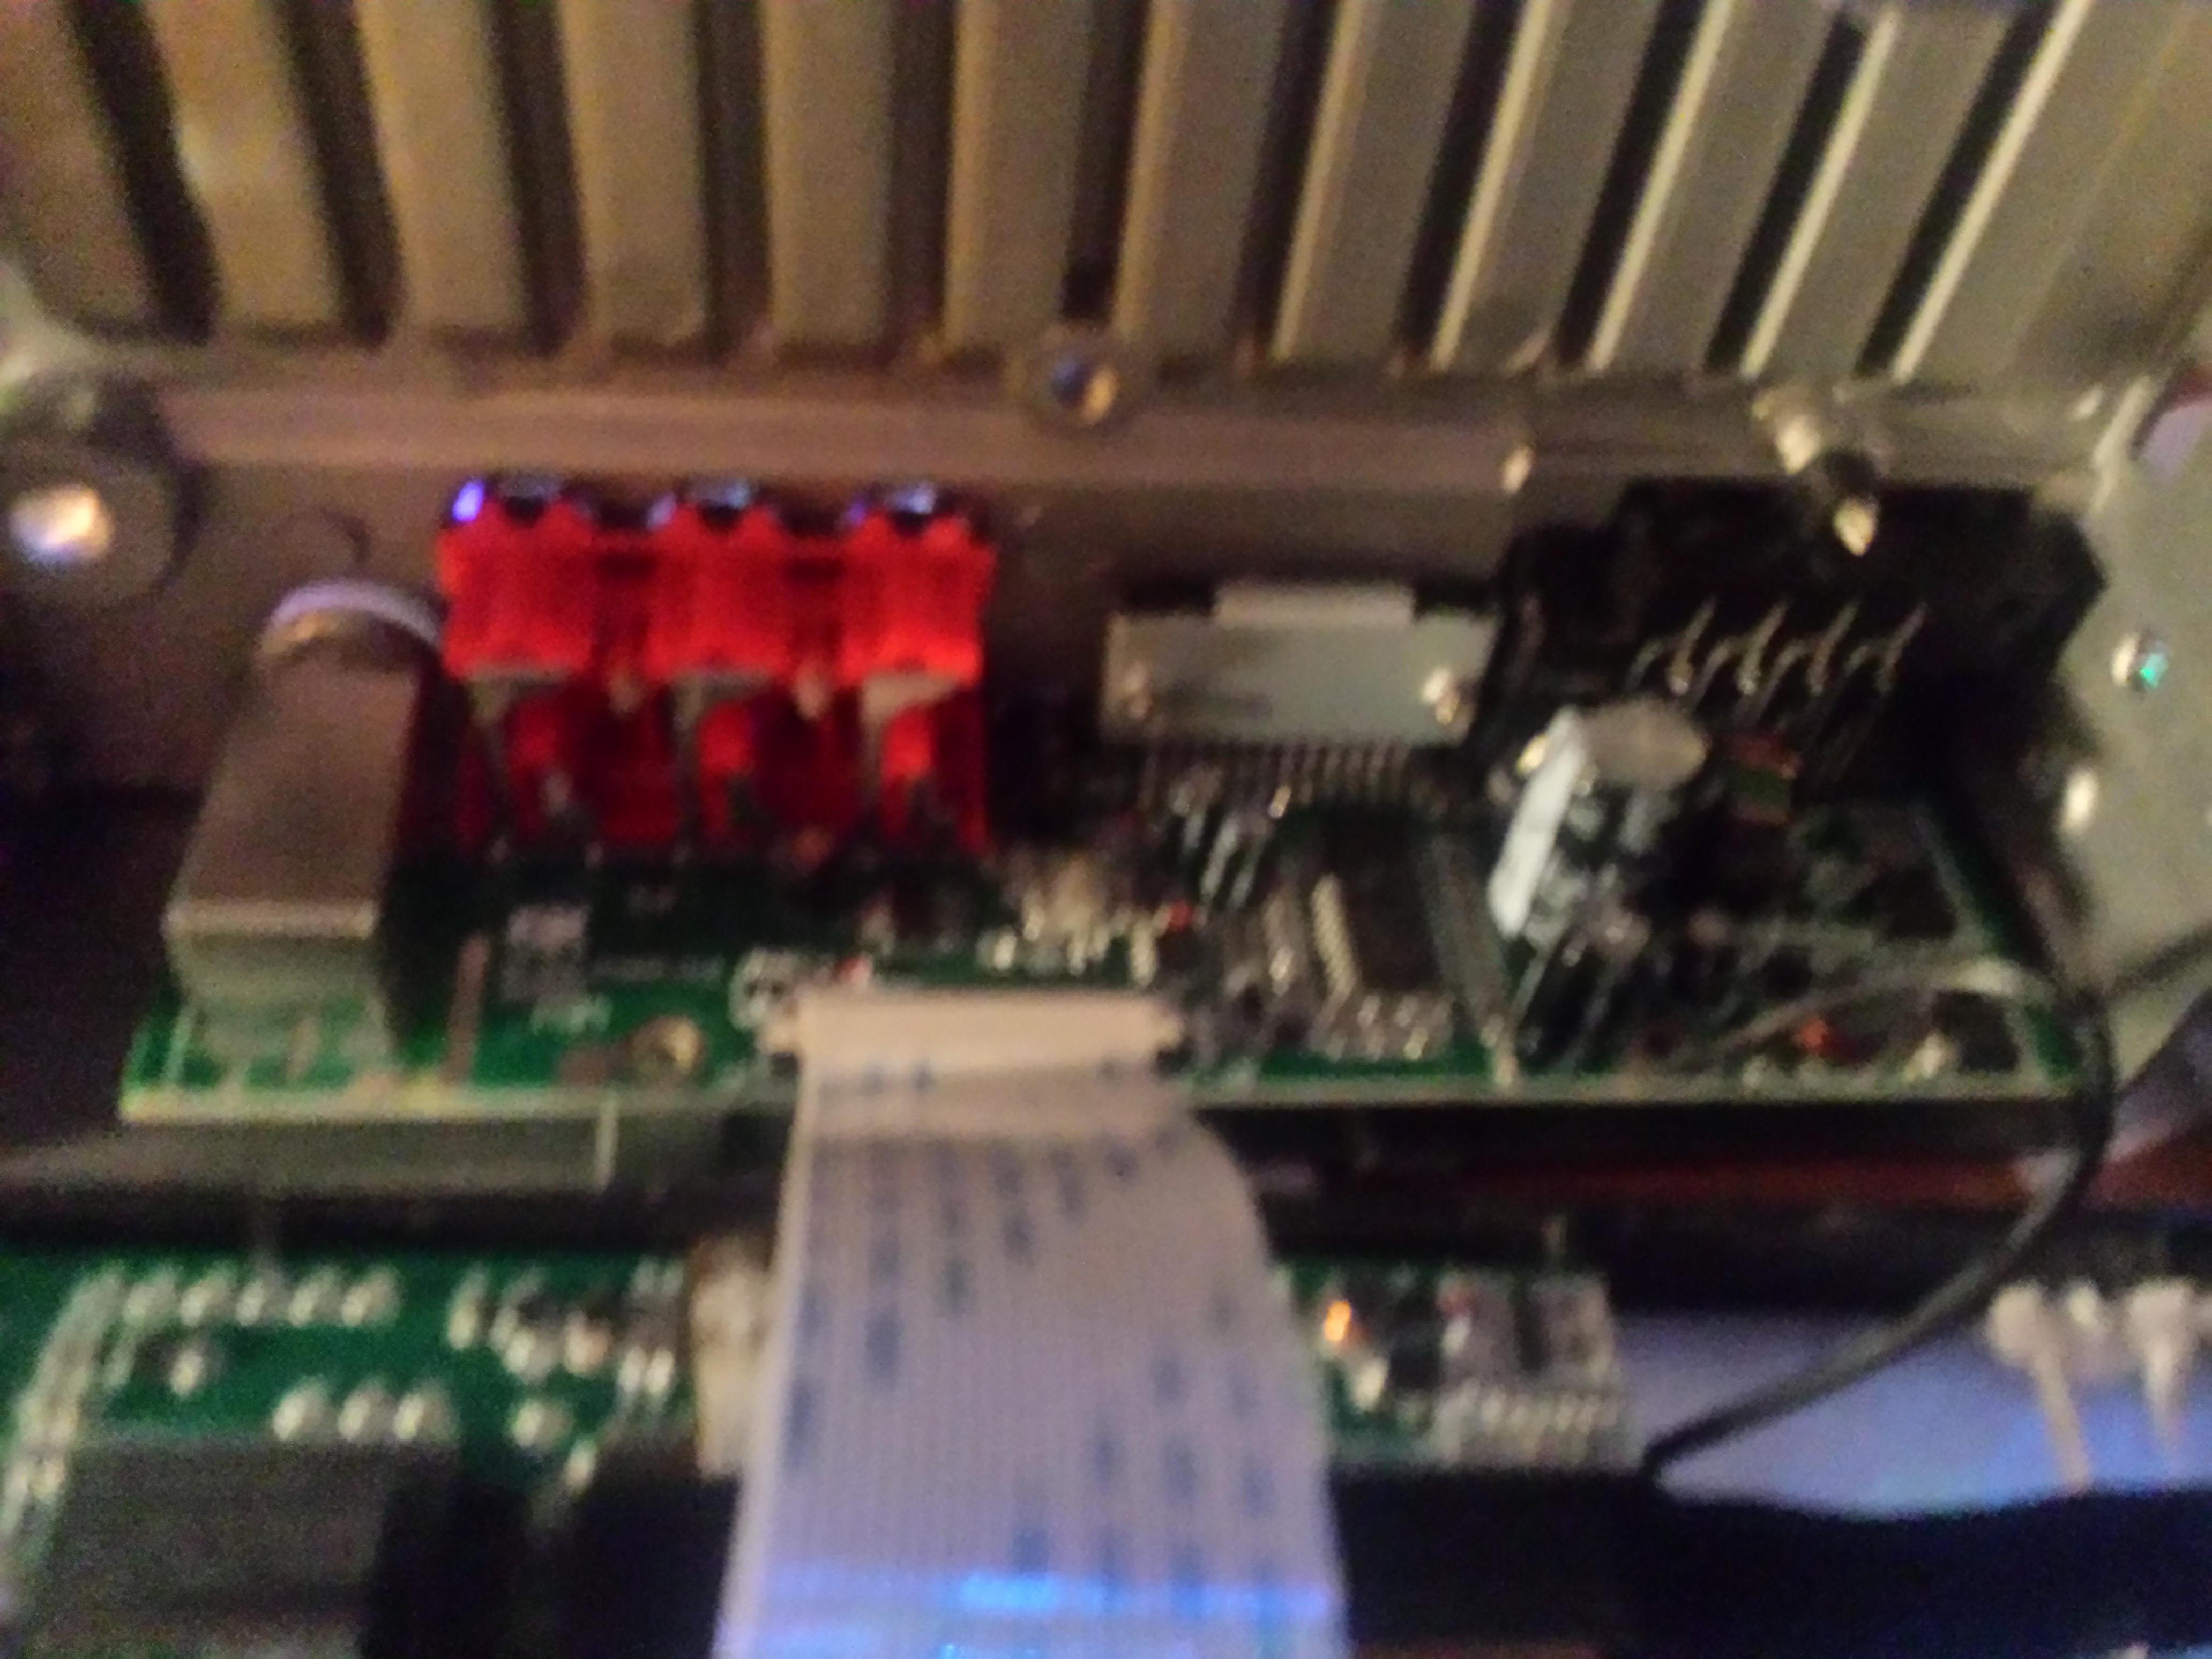 Chińczyk 7012b brak dźwięku - elektroda pl